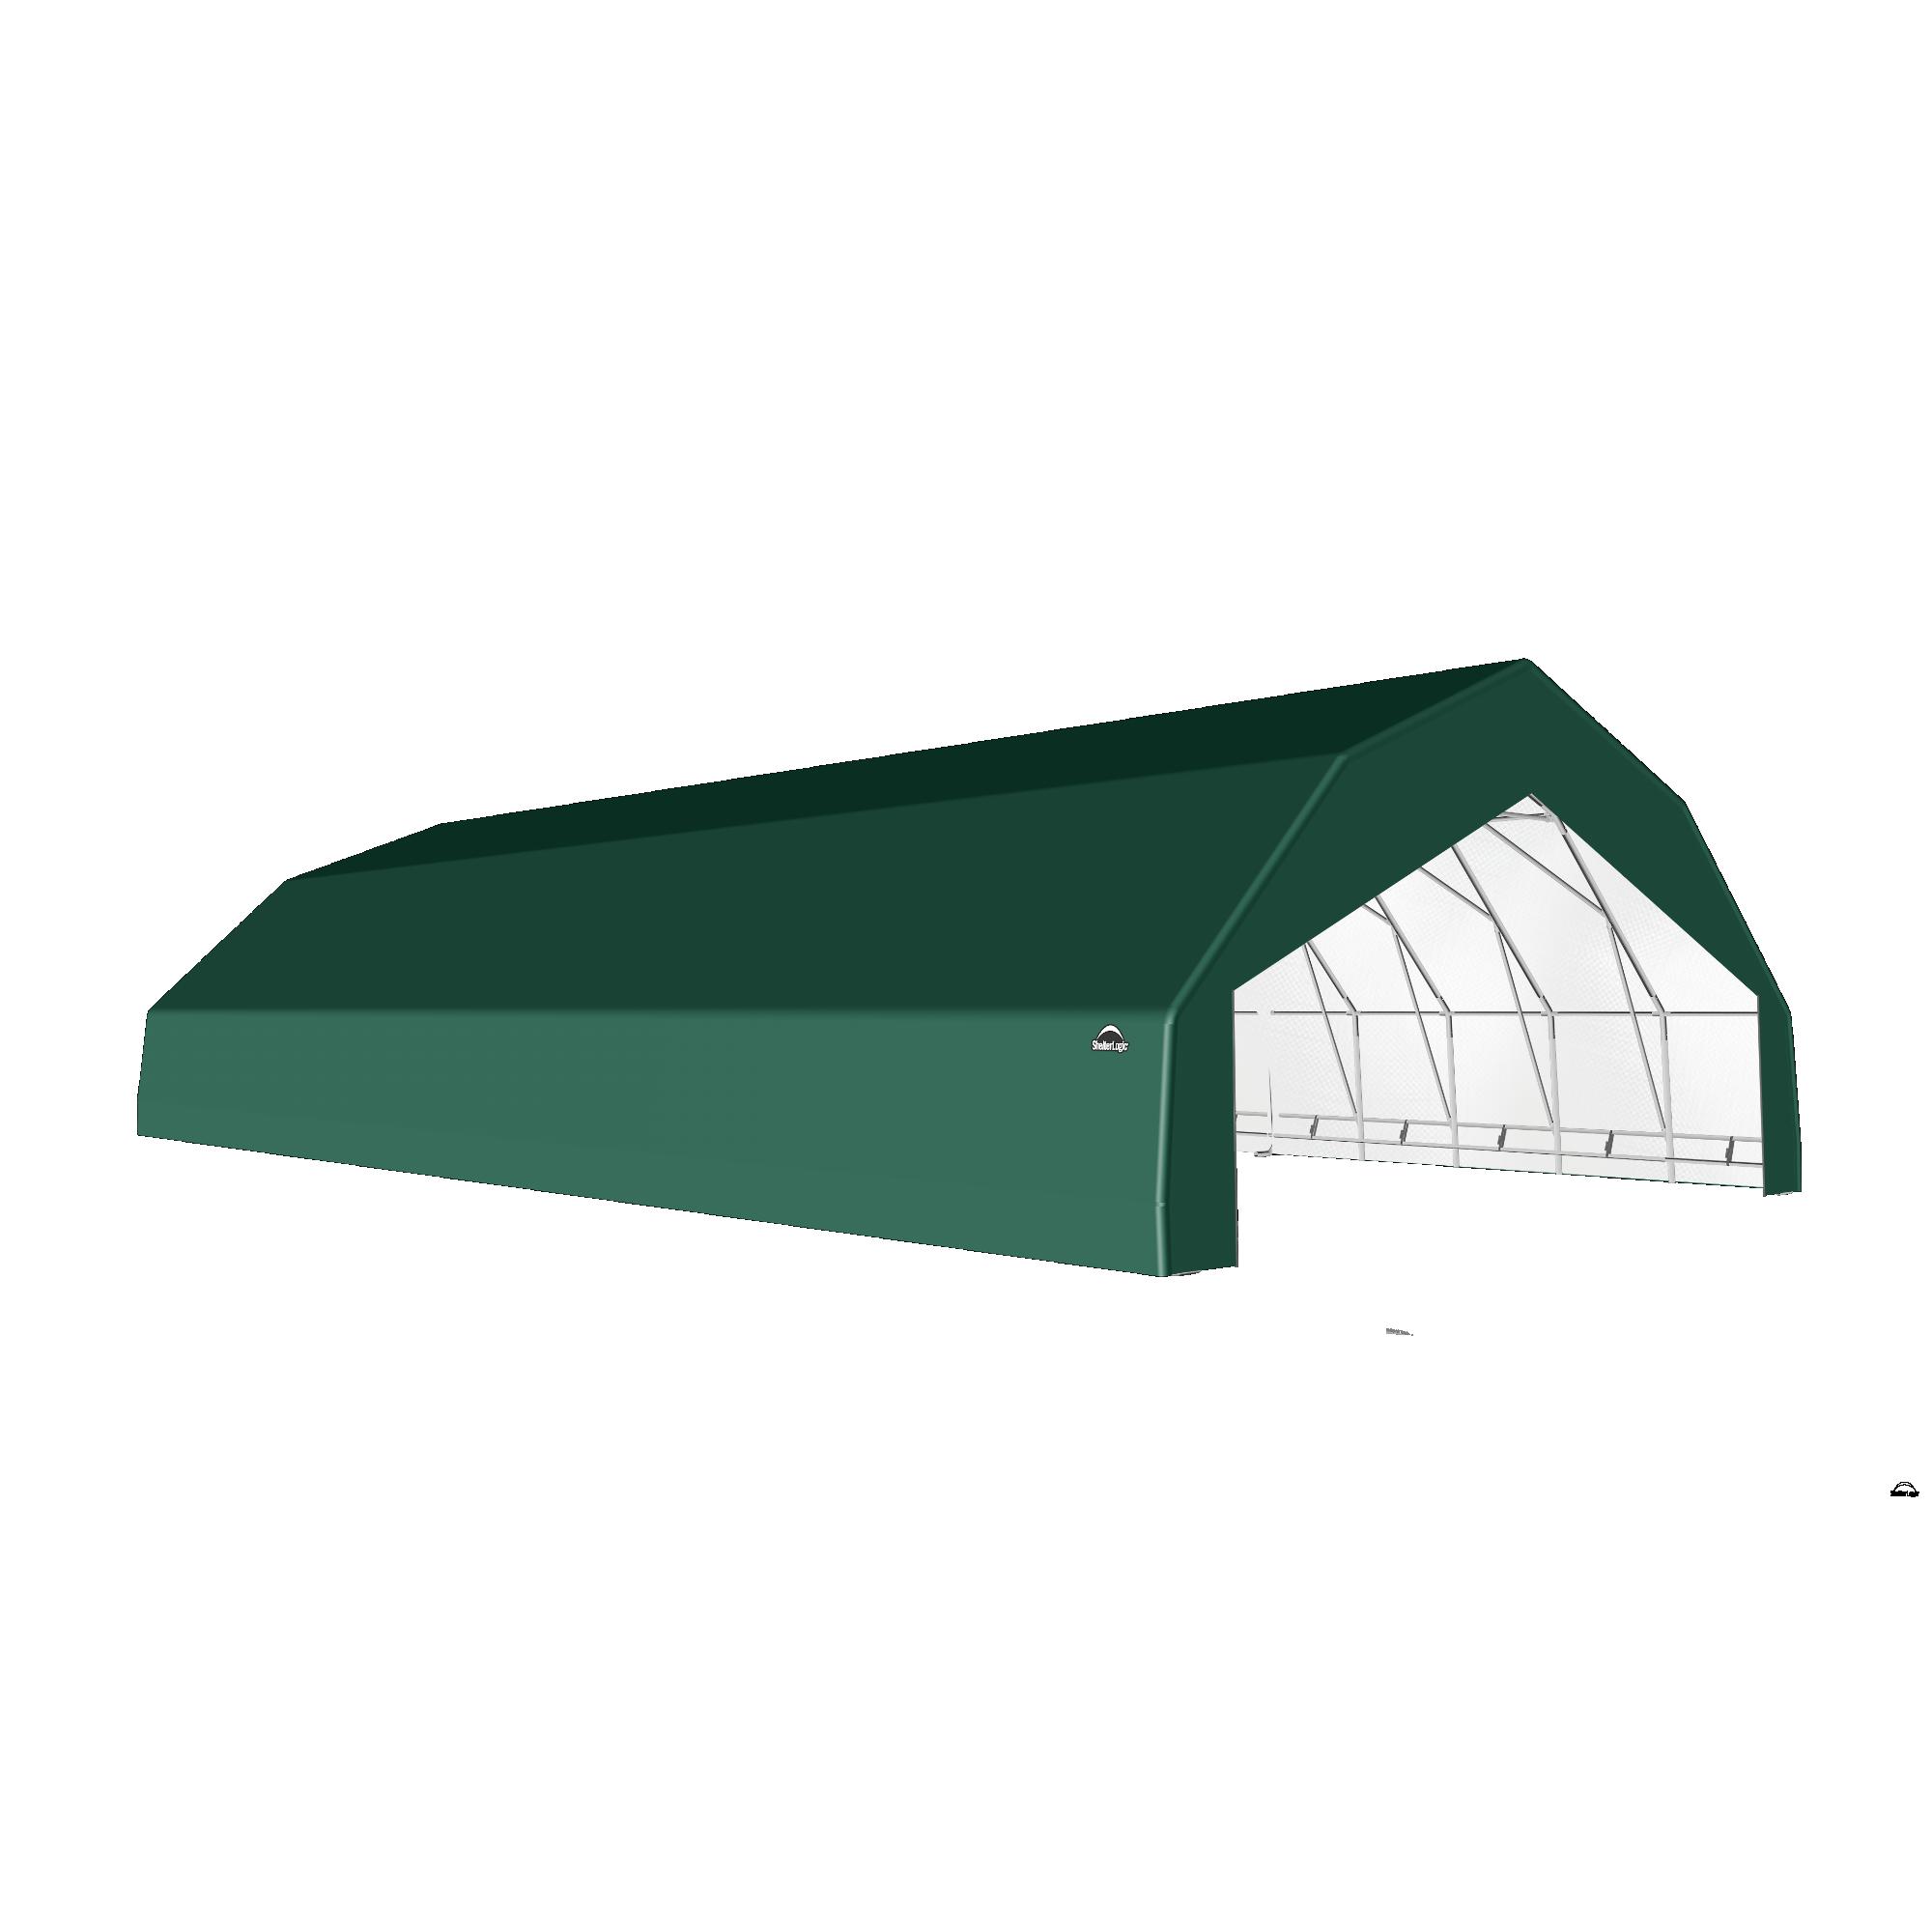 SP Barn 30X52X15 Green 14 oz PE Shelter